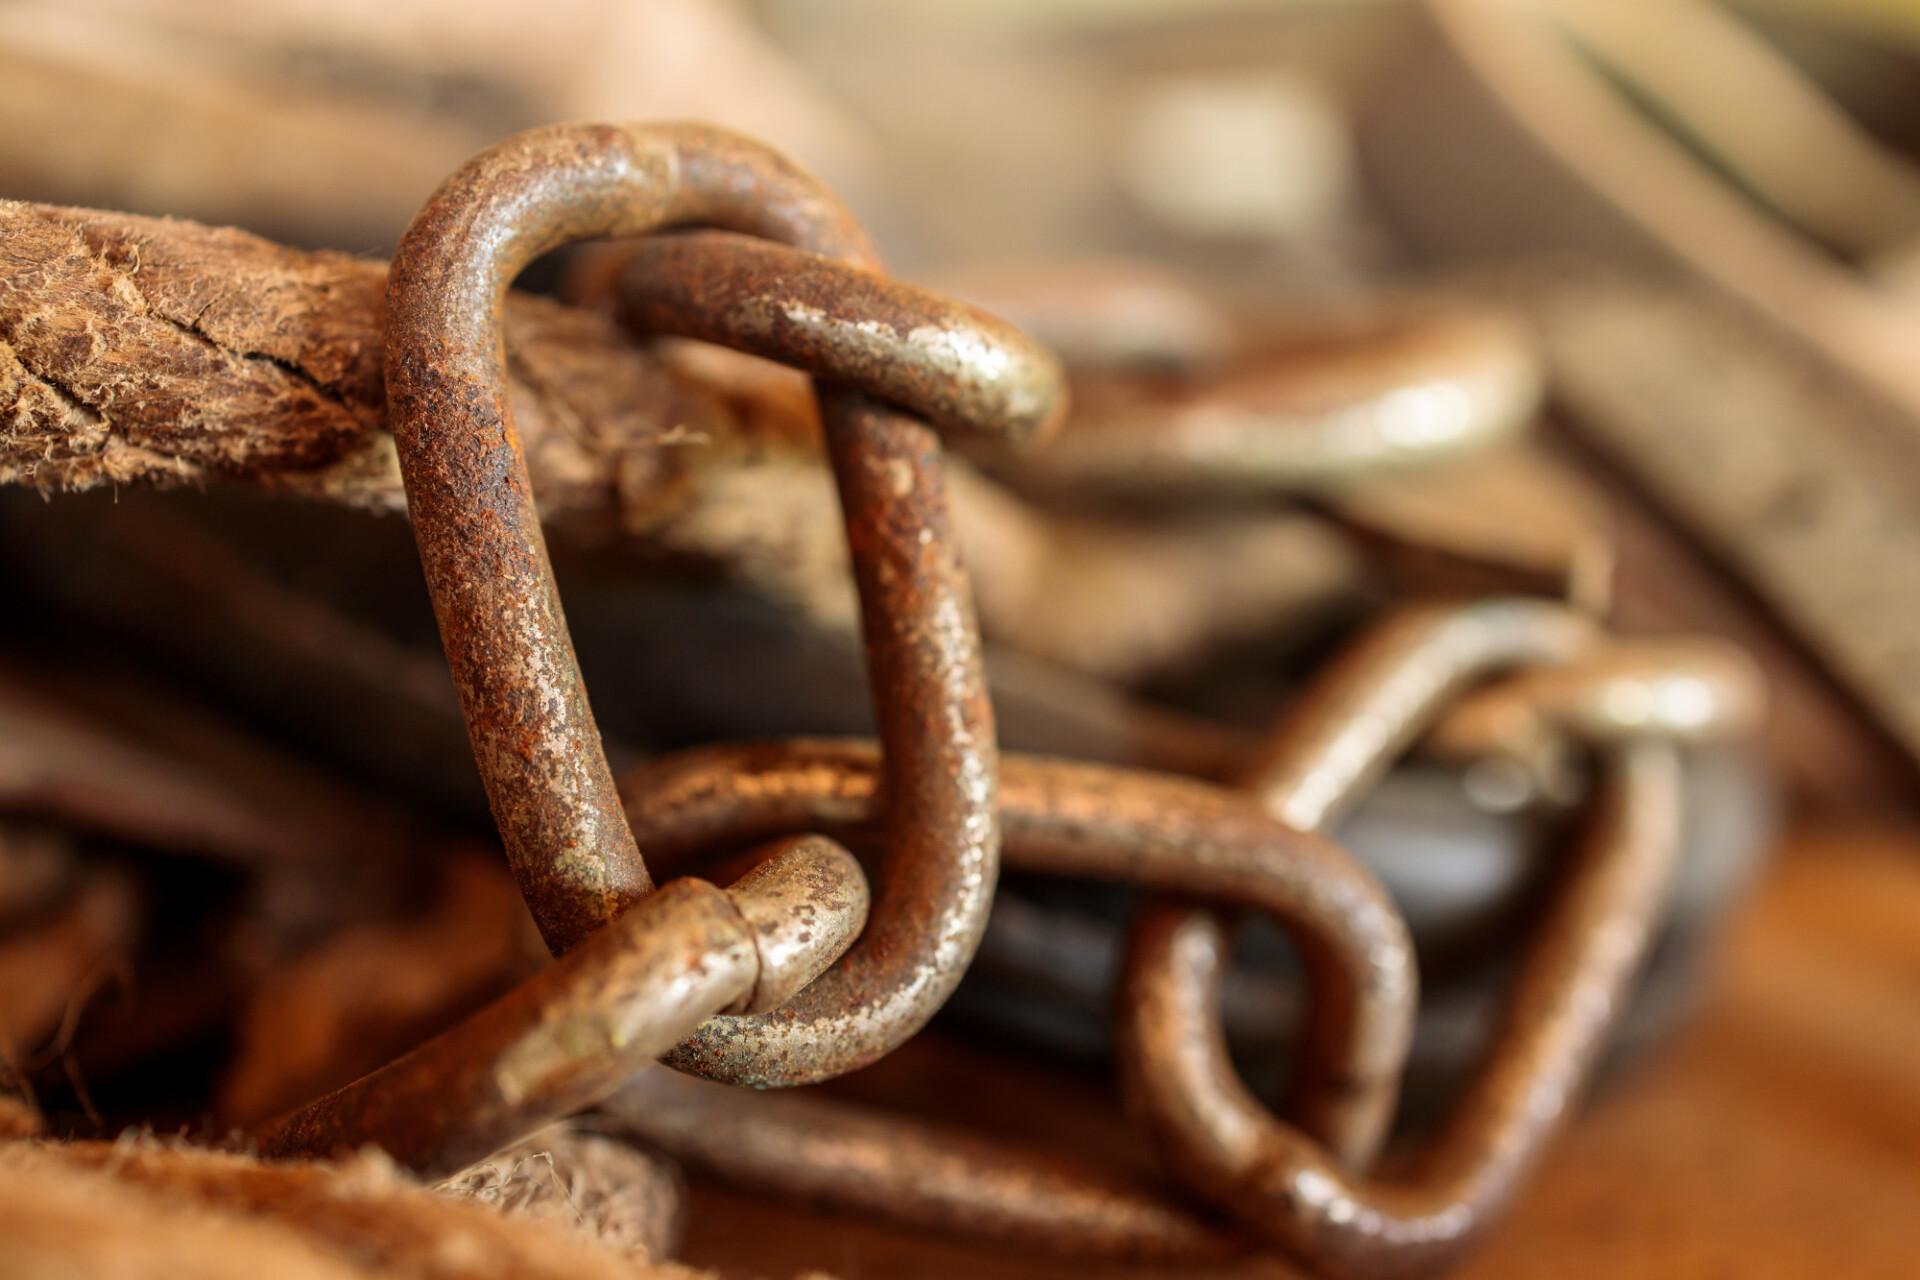 Rusty iron chain